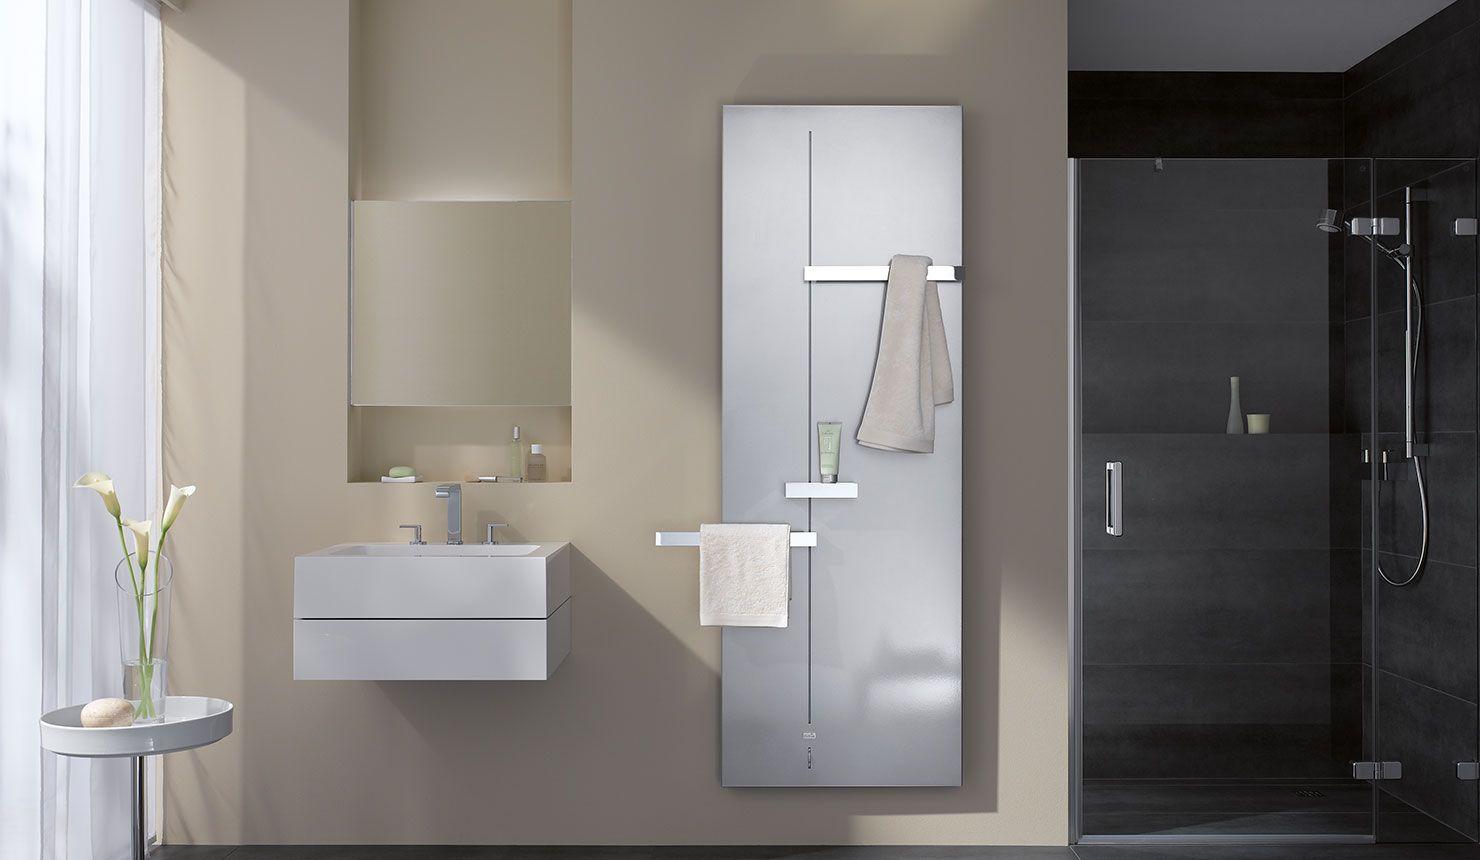 Interessant Kermi Fedon Design- und Badheizkörper in modernem Badezimmer  PB45